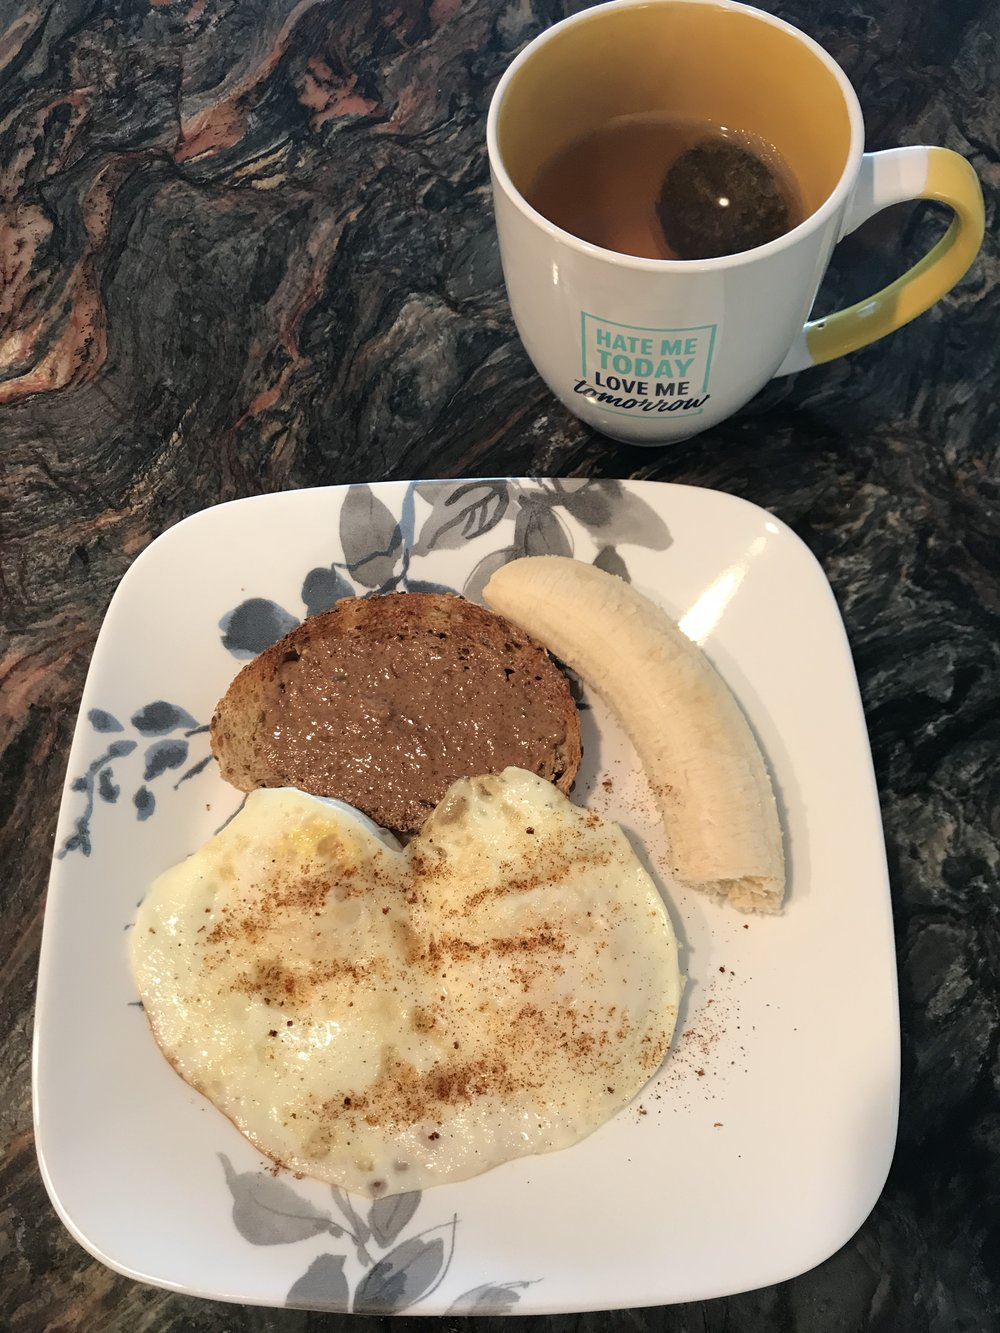 Breakfast - Multi-grain Bread (1 yellow), Almond Butter (1 tsp), 1 banana (2 purples), 2 fried eggs (1 red)